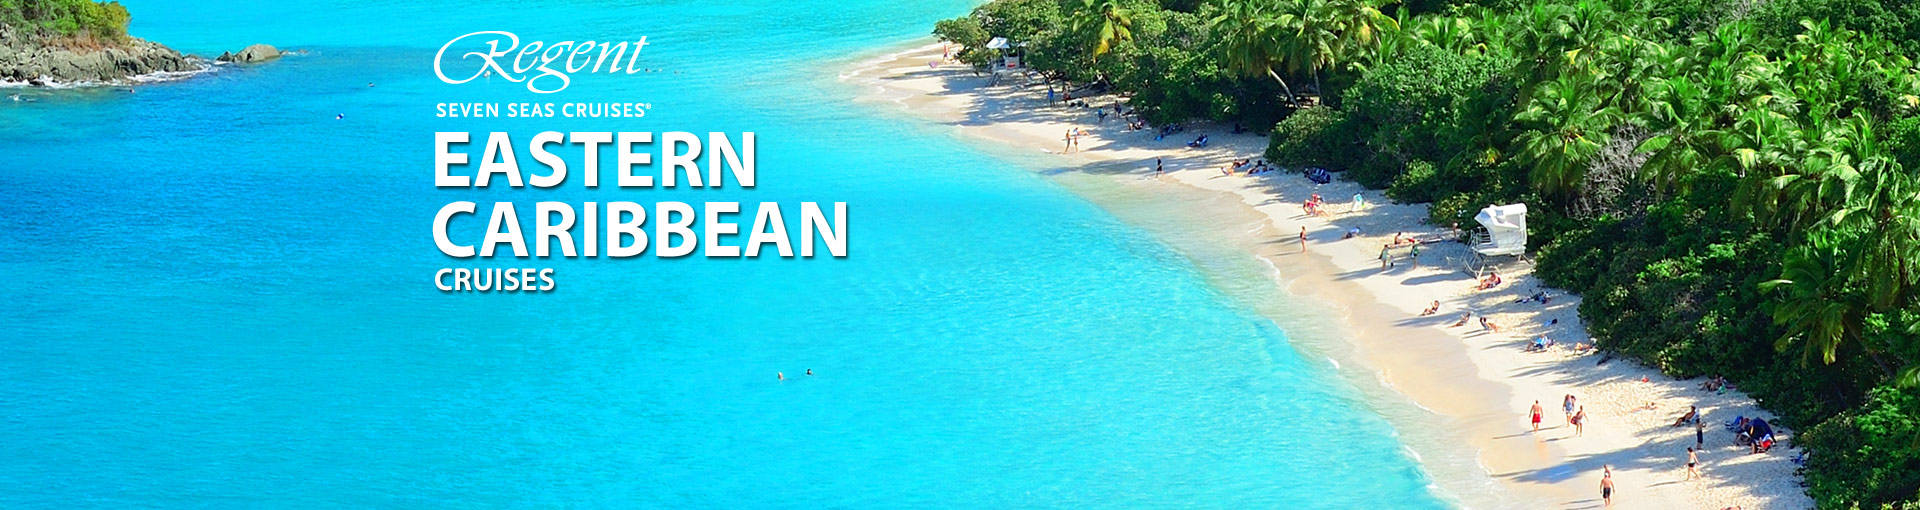 Regent Seven Seas Cruises Eastern Caribbean Cruise